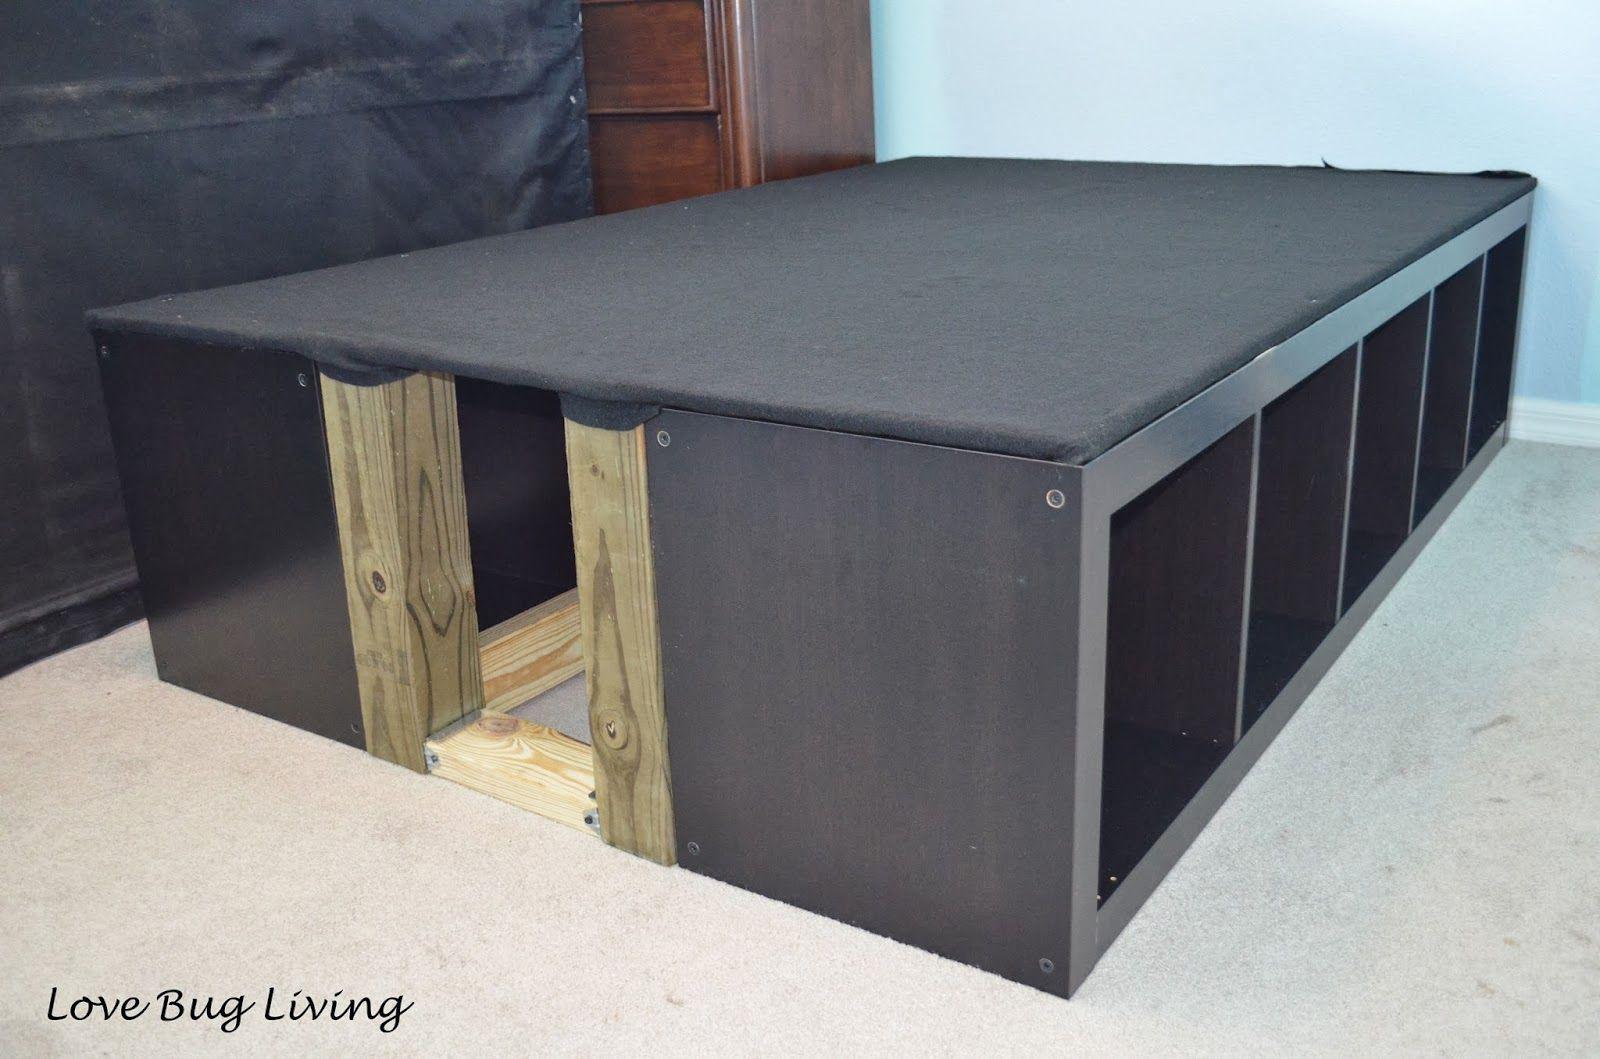 Ikea Expedit Hack Platform Bed | Ikea platform bed, Ikea ...